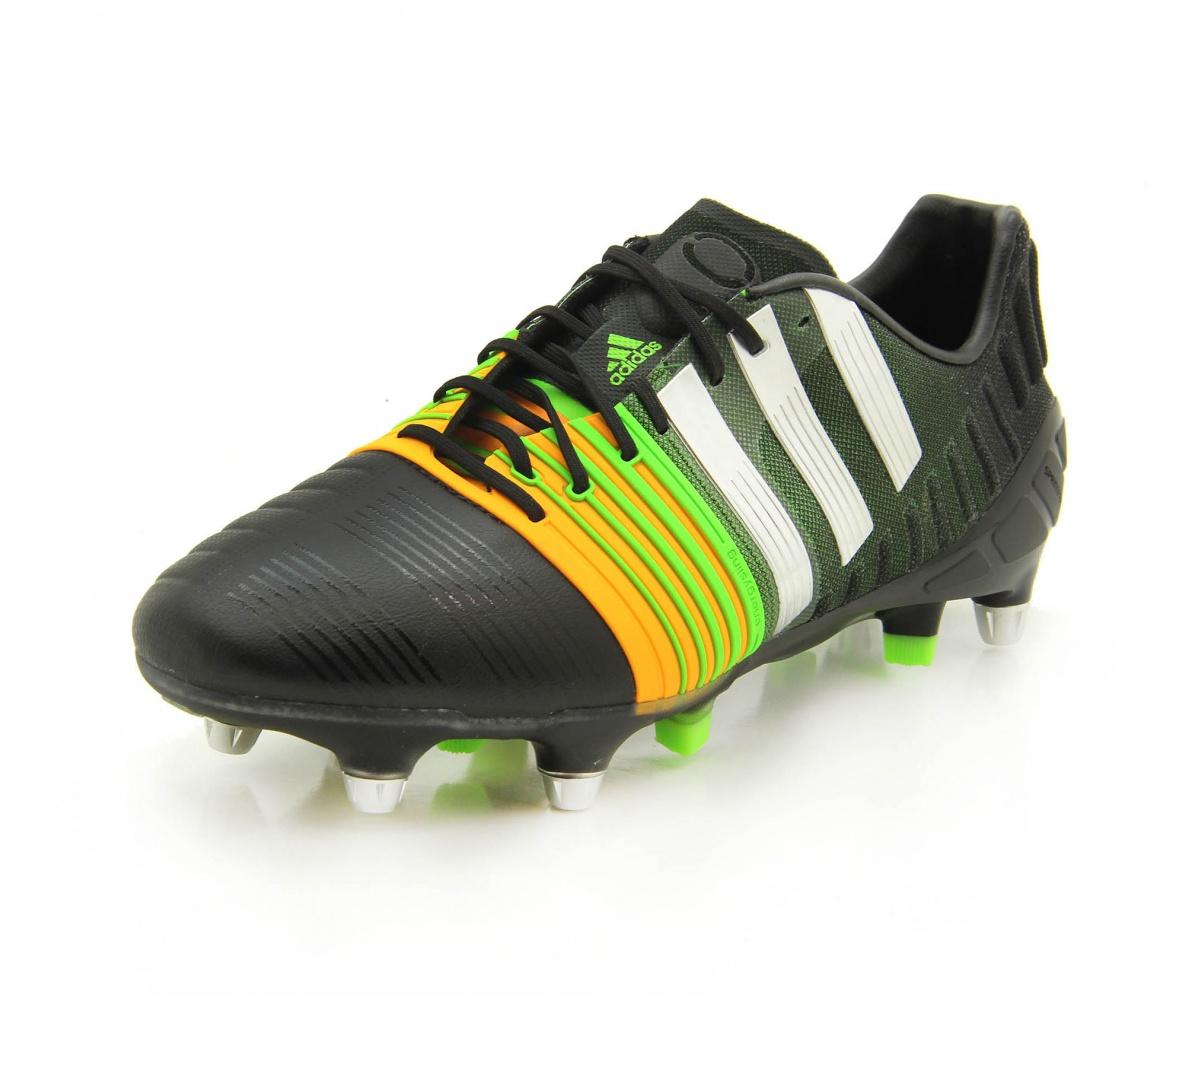 4e842c770c0cb Chuteira Adidas Nitro Charge 1.0 SG Campo - Mundo do Futebol